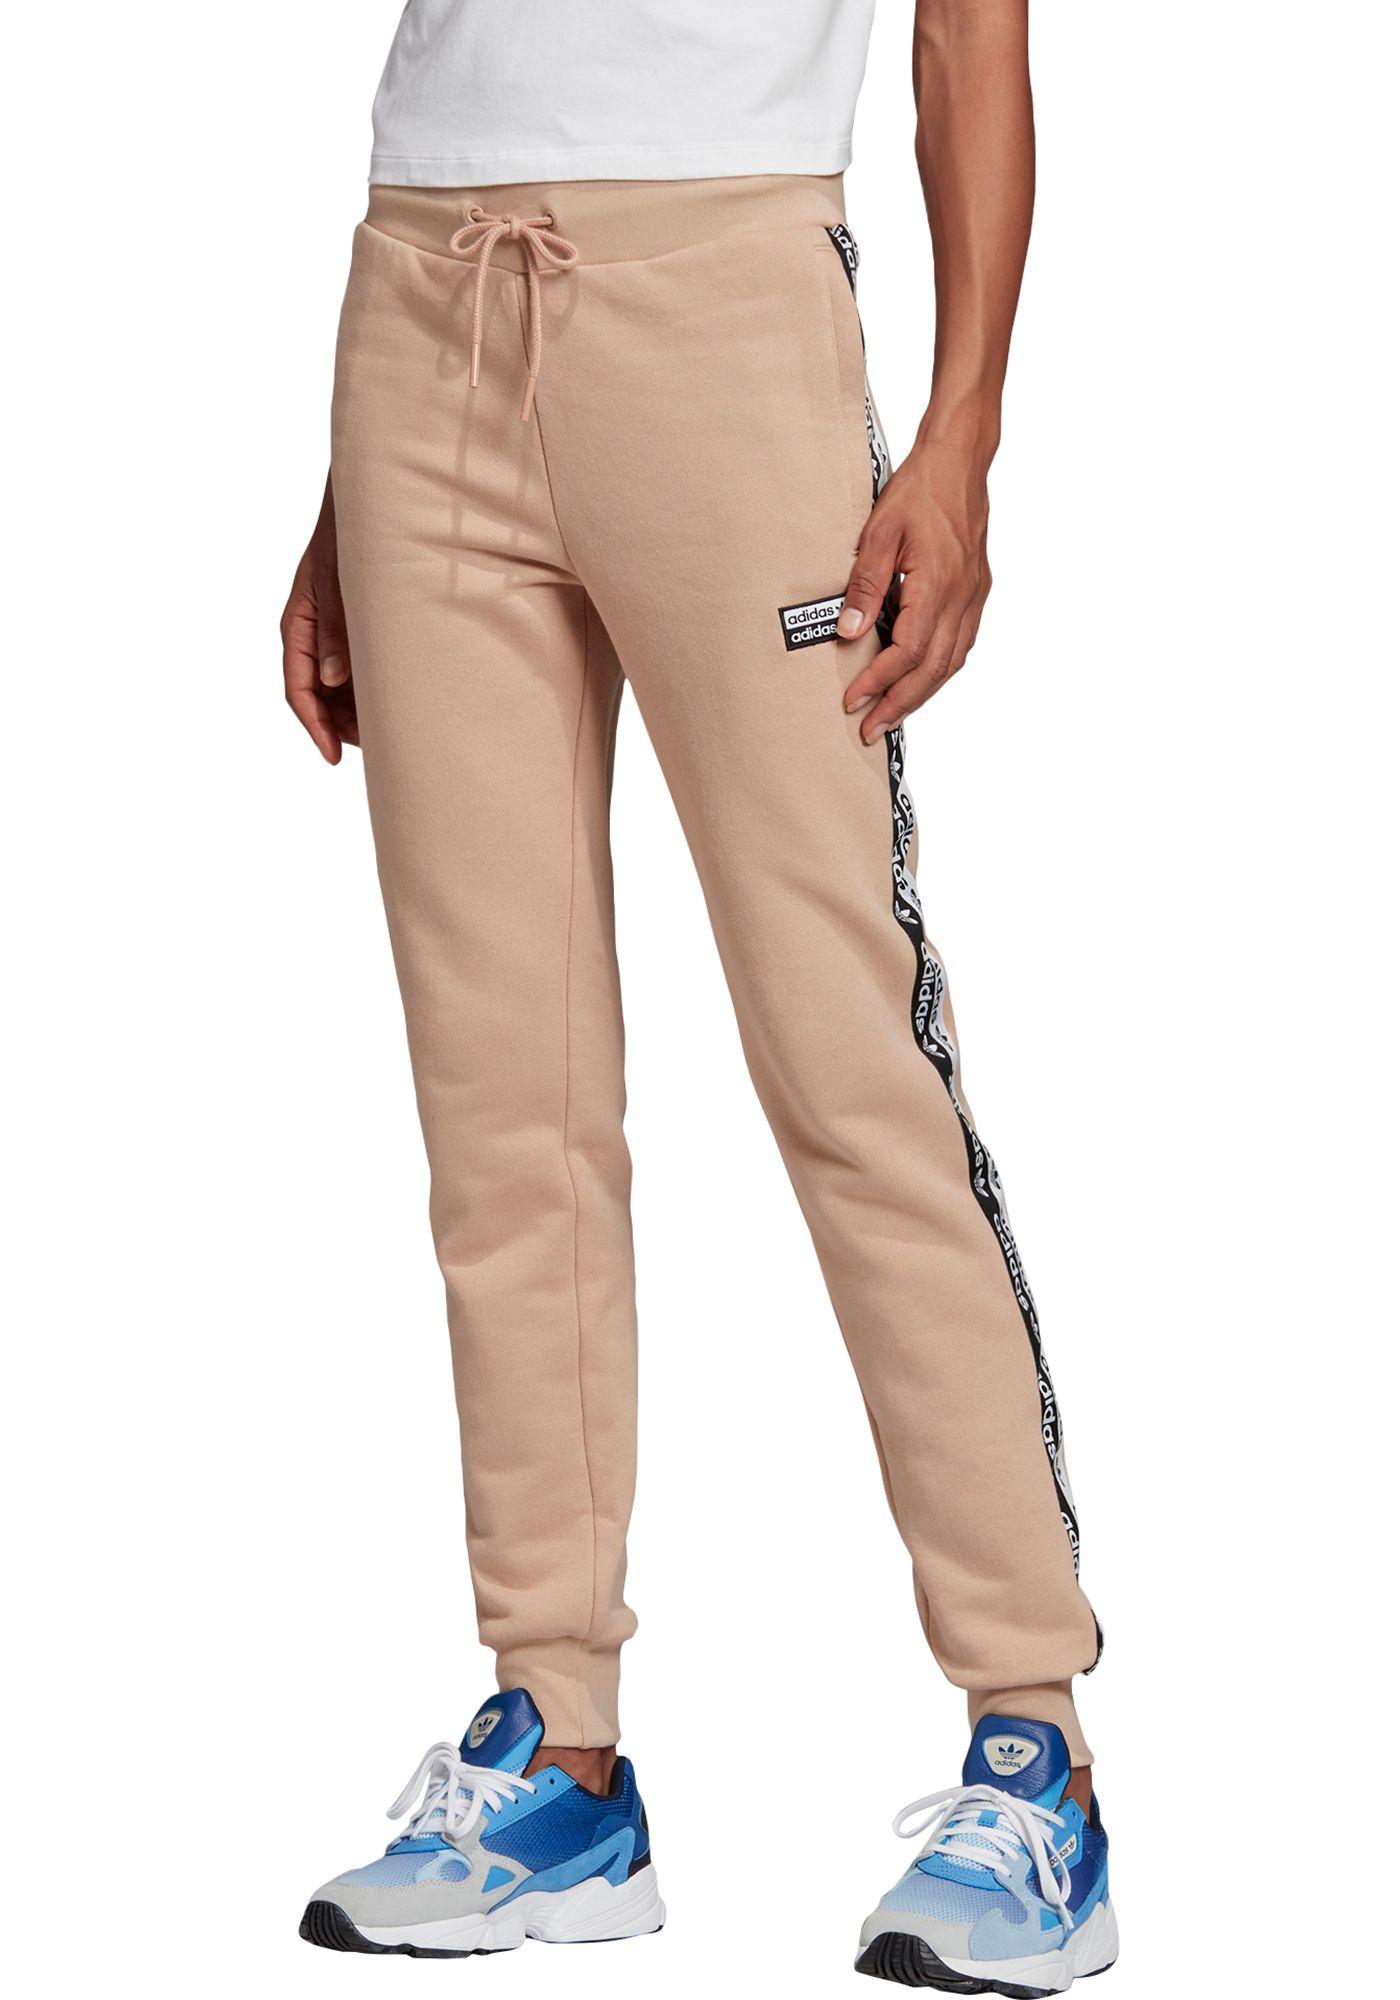 adidas Originals Women's Vocal Cuff Pants